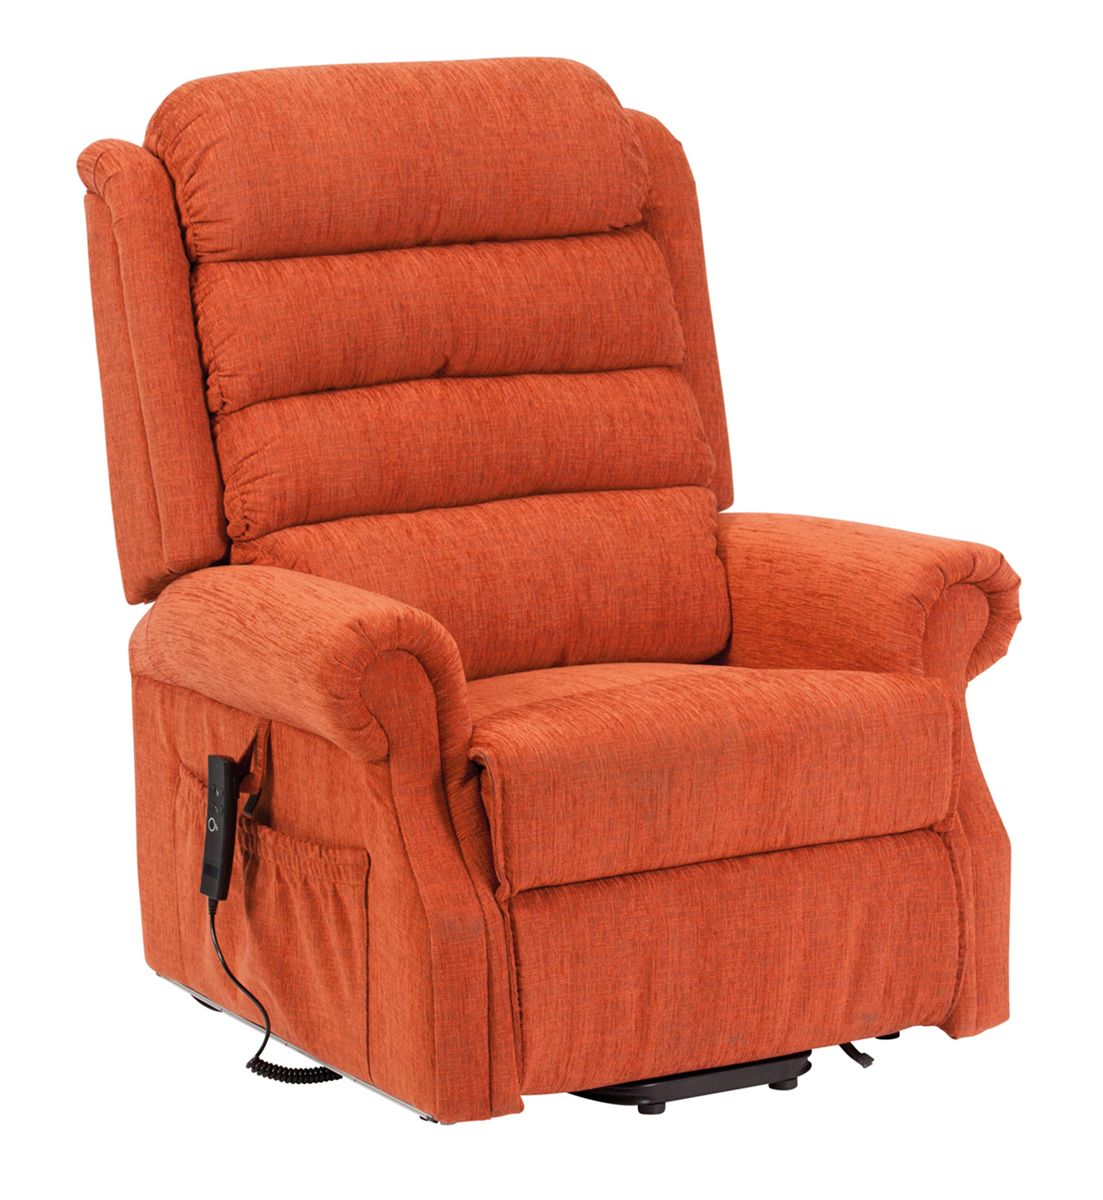 Serena Deluxe Riser Recliner Chair | Recliner, Chair, Home decor